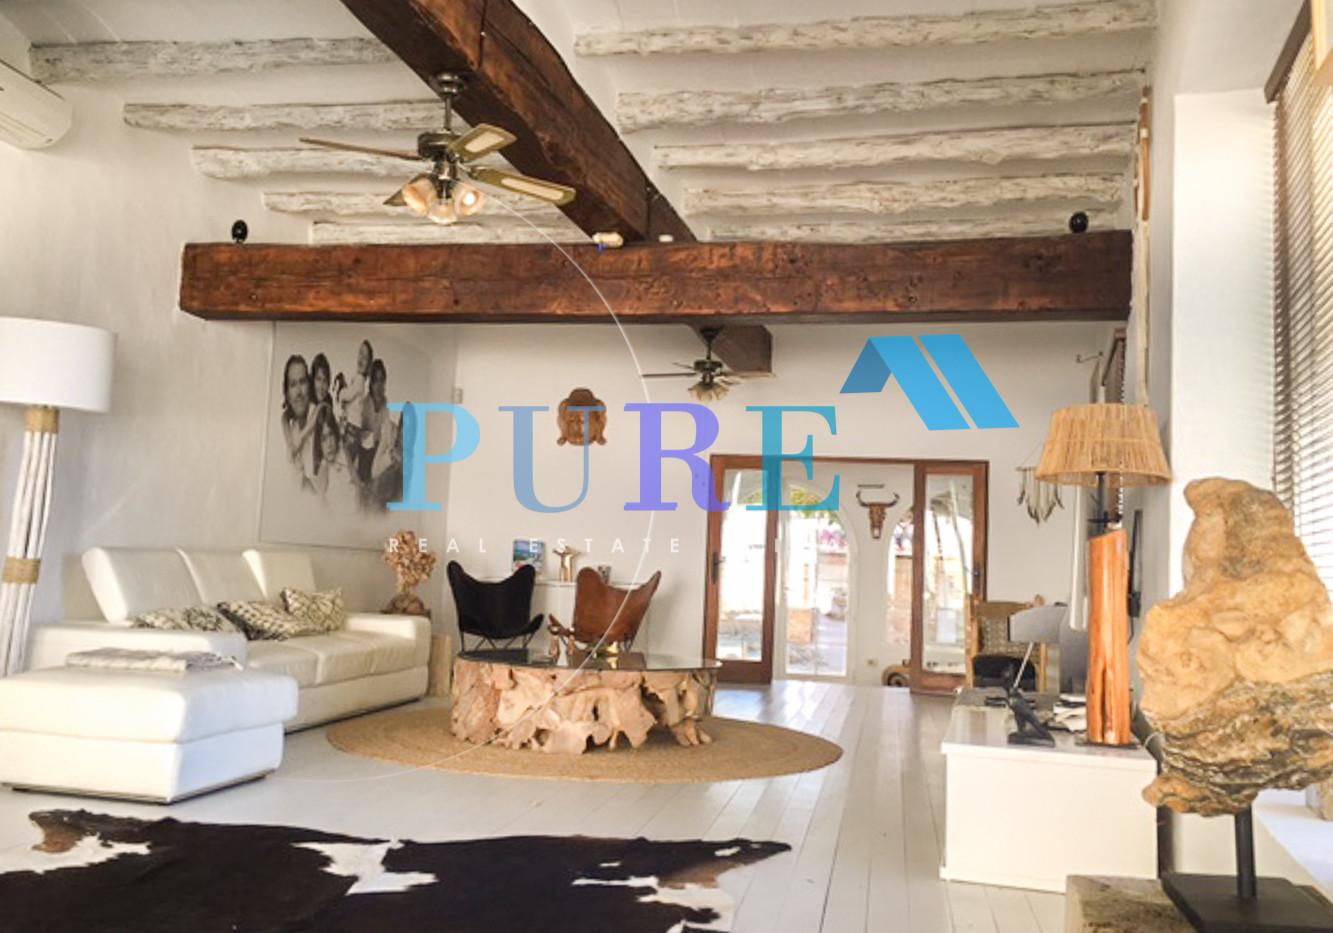 PURE Ibiza-1136-2.JPG